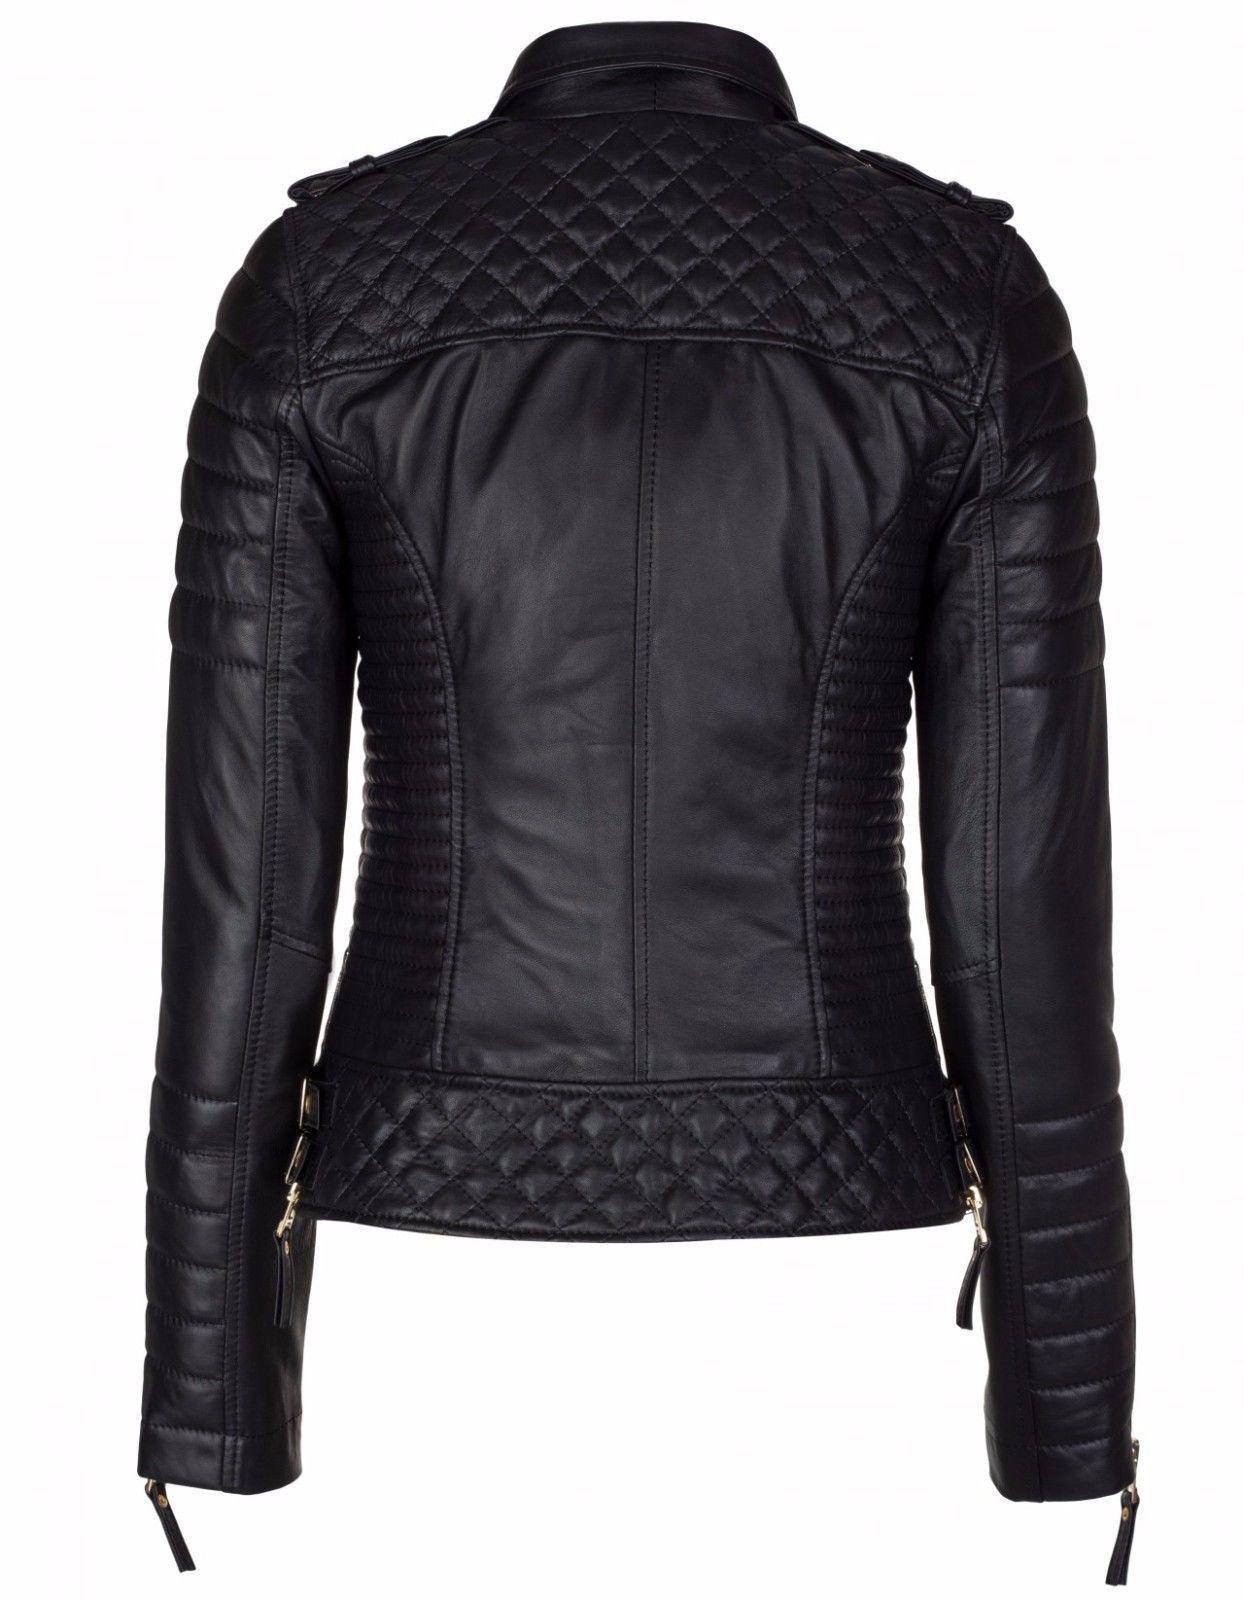 Women/'s Genuine Lambskin Motorcycle Real Leather Jacket Slim fit Biker Jacket 01